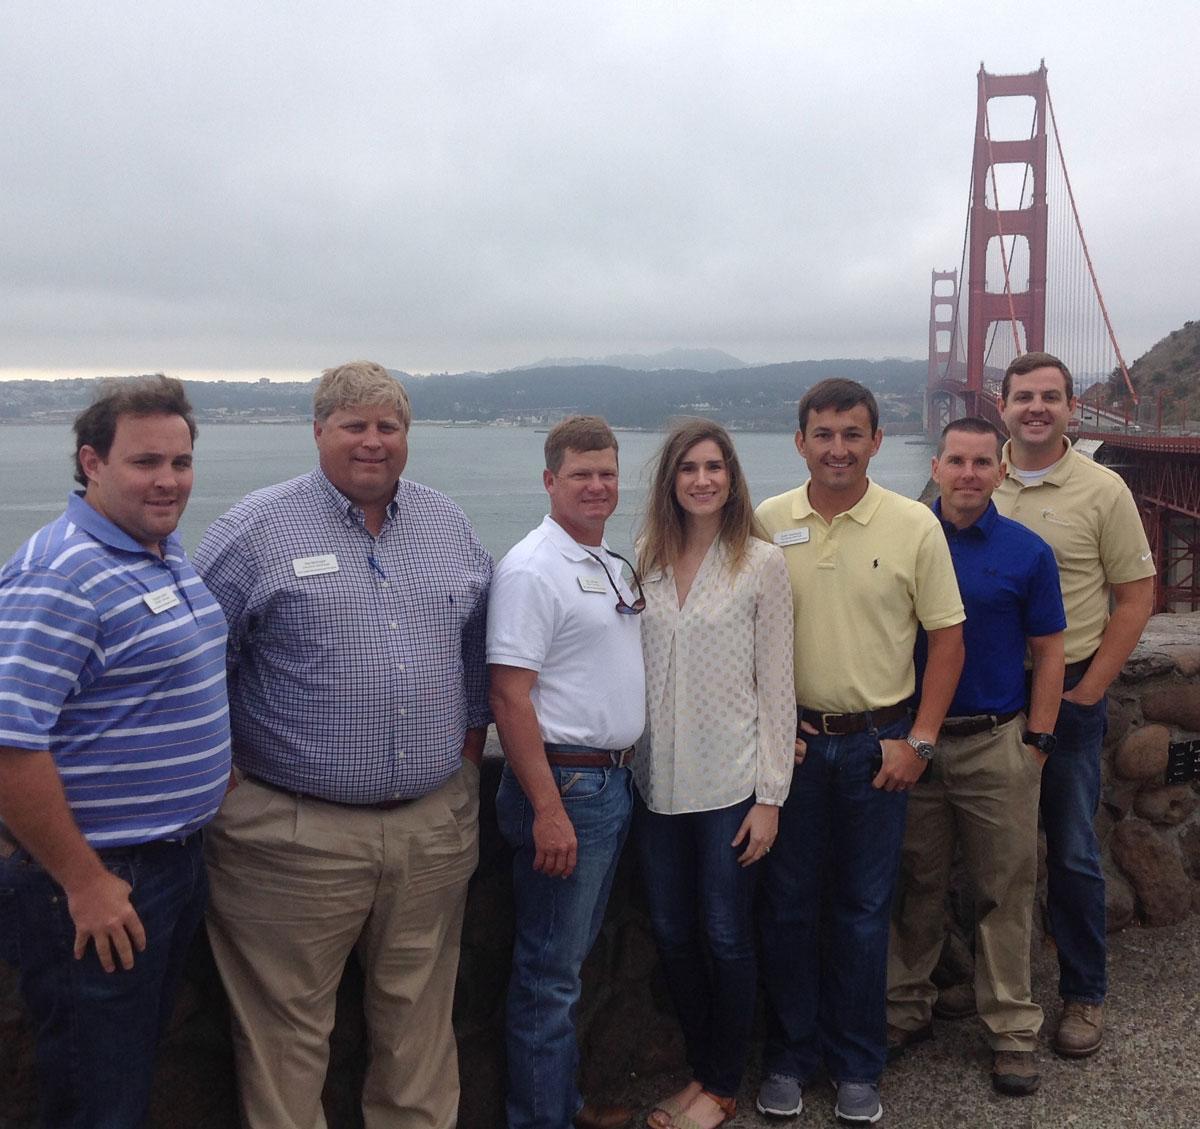 Group shot of people standing near the San Francisco Golden Gate Bridge